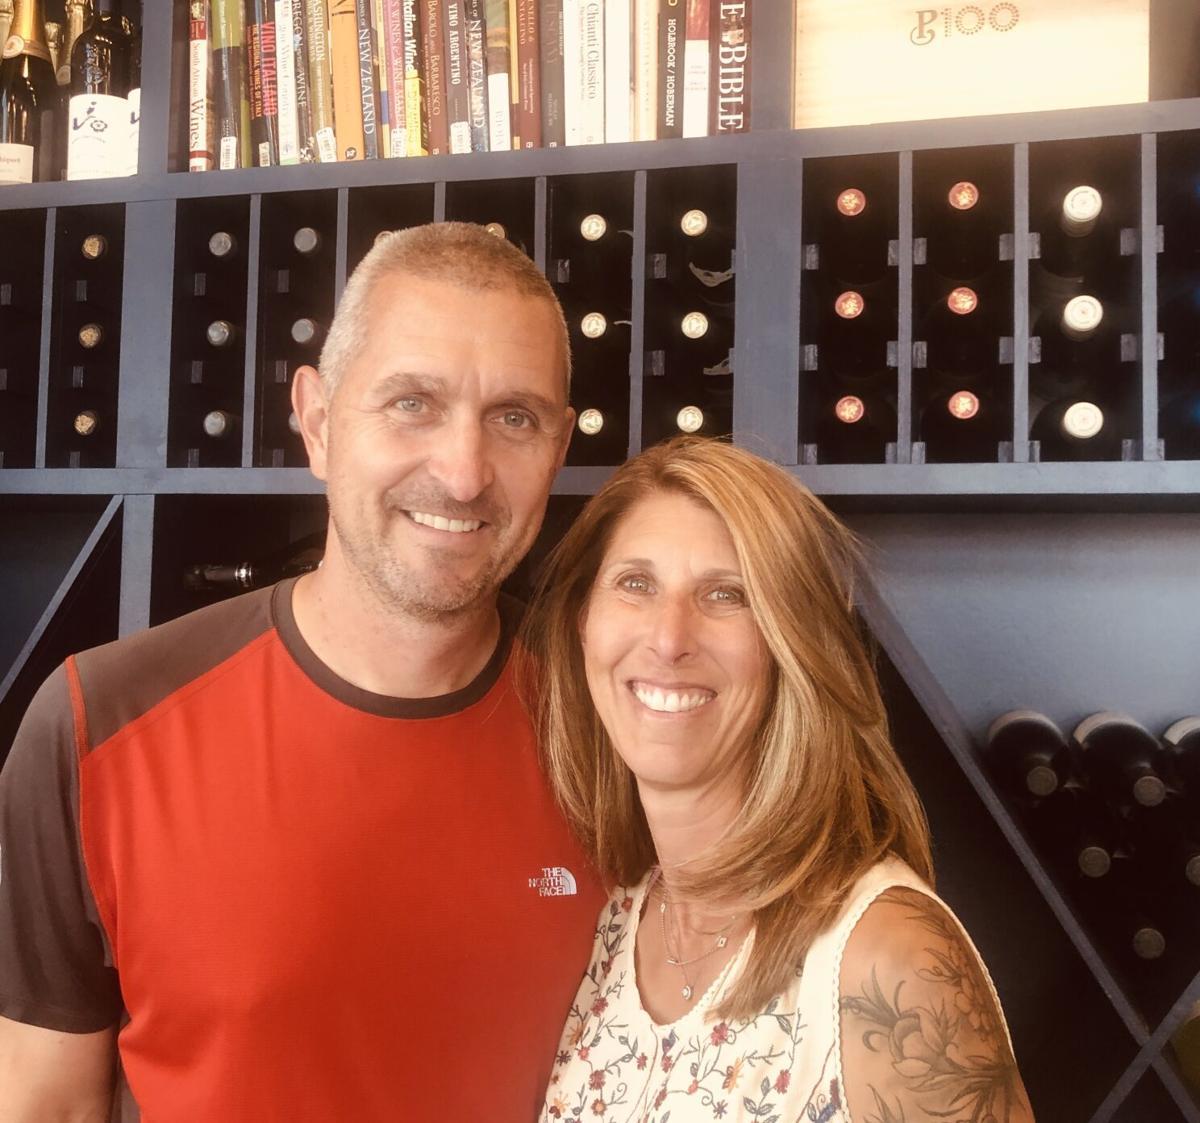 Colorado Springs couple open snazzy wine bar